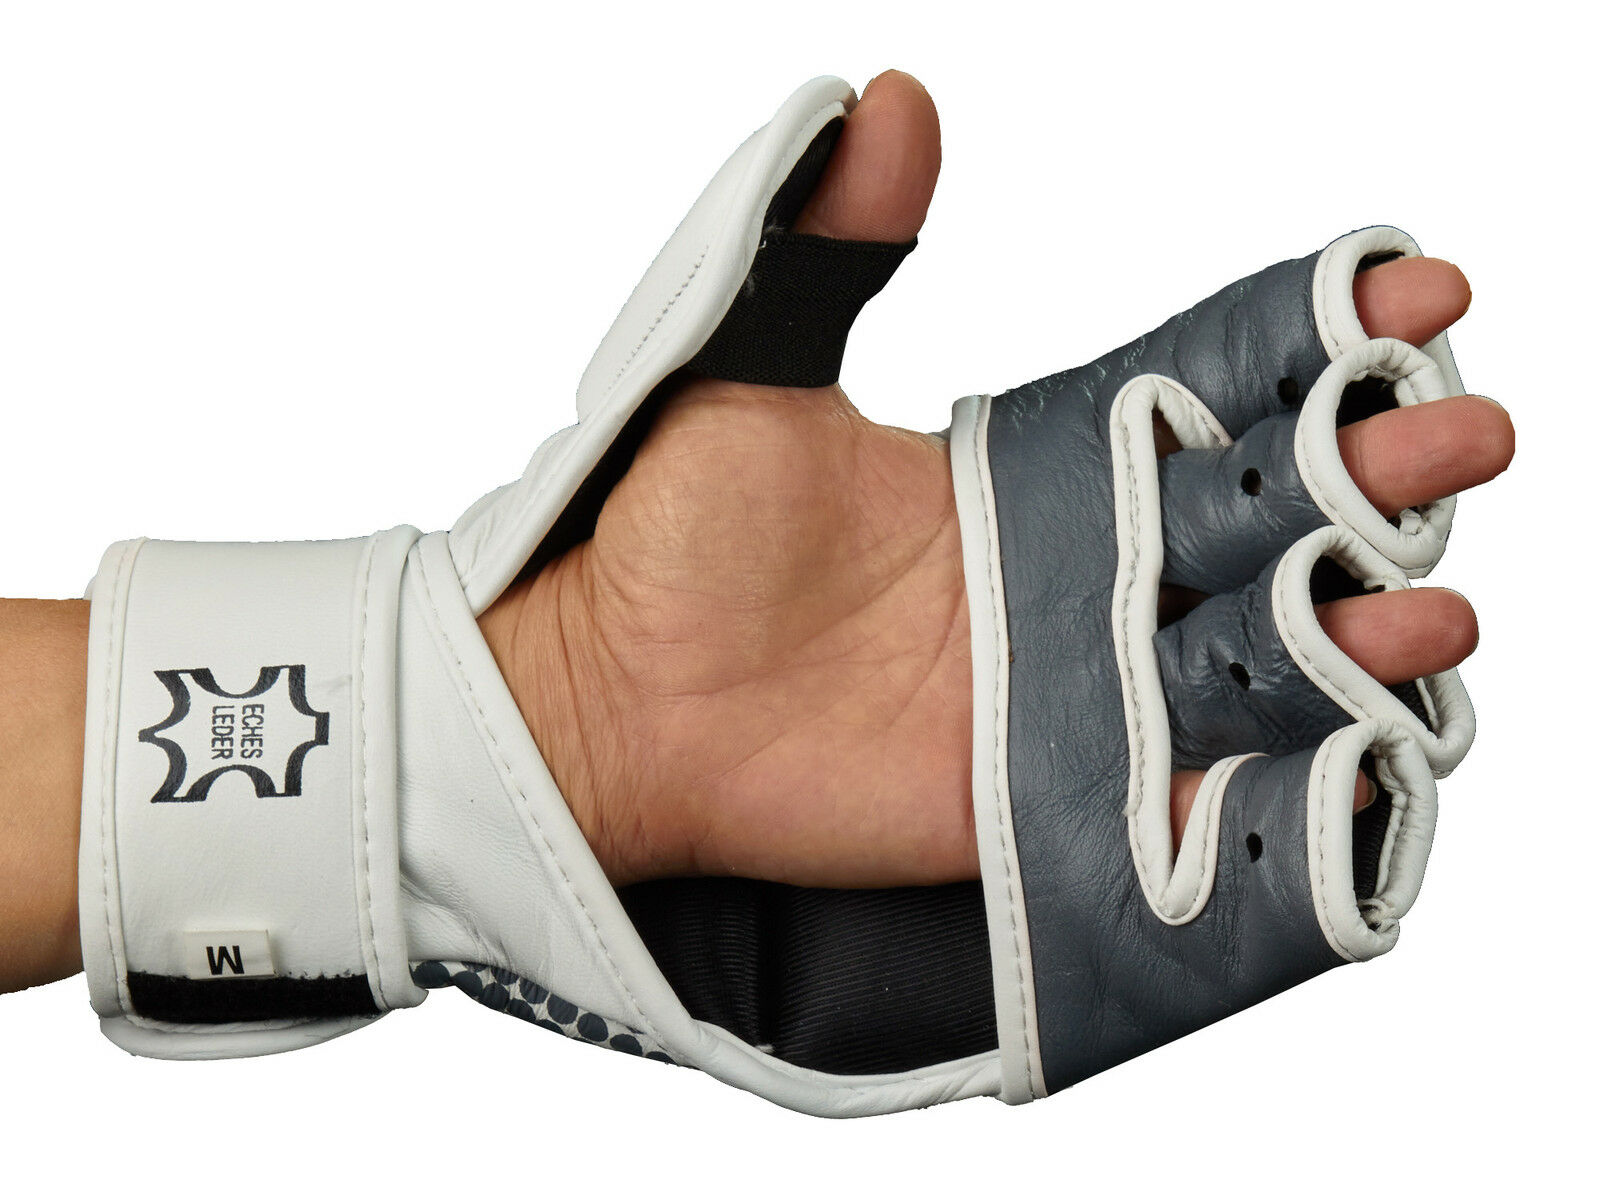 Ju-Sports MMA Handschutz  Sparring PRO PRO PRO  - MMA Handschutz - Freefight Handschuhe d9a4f9